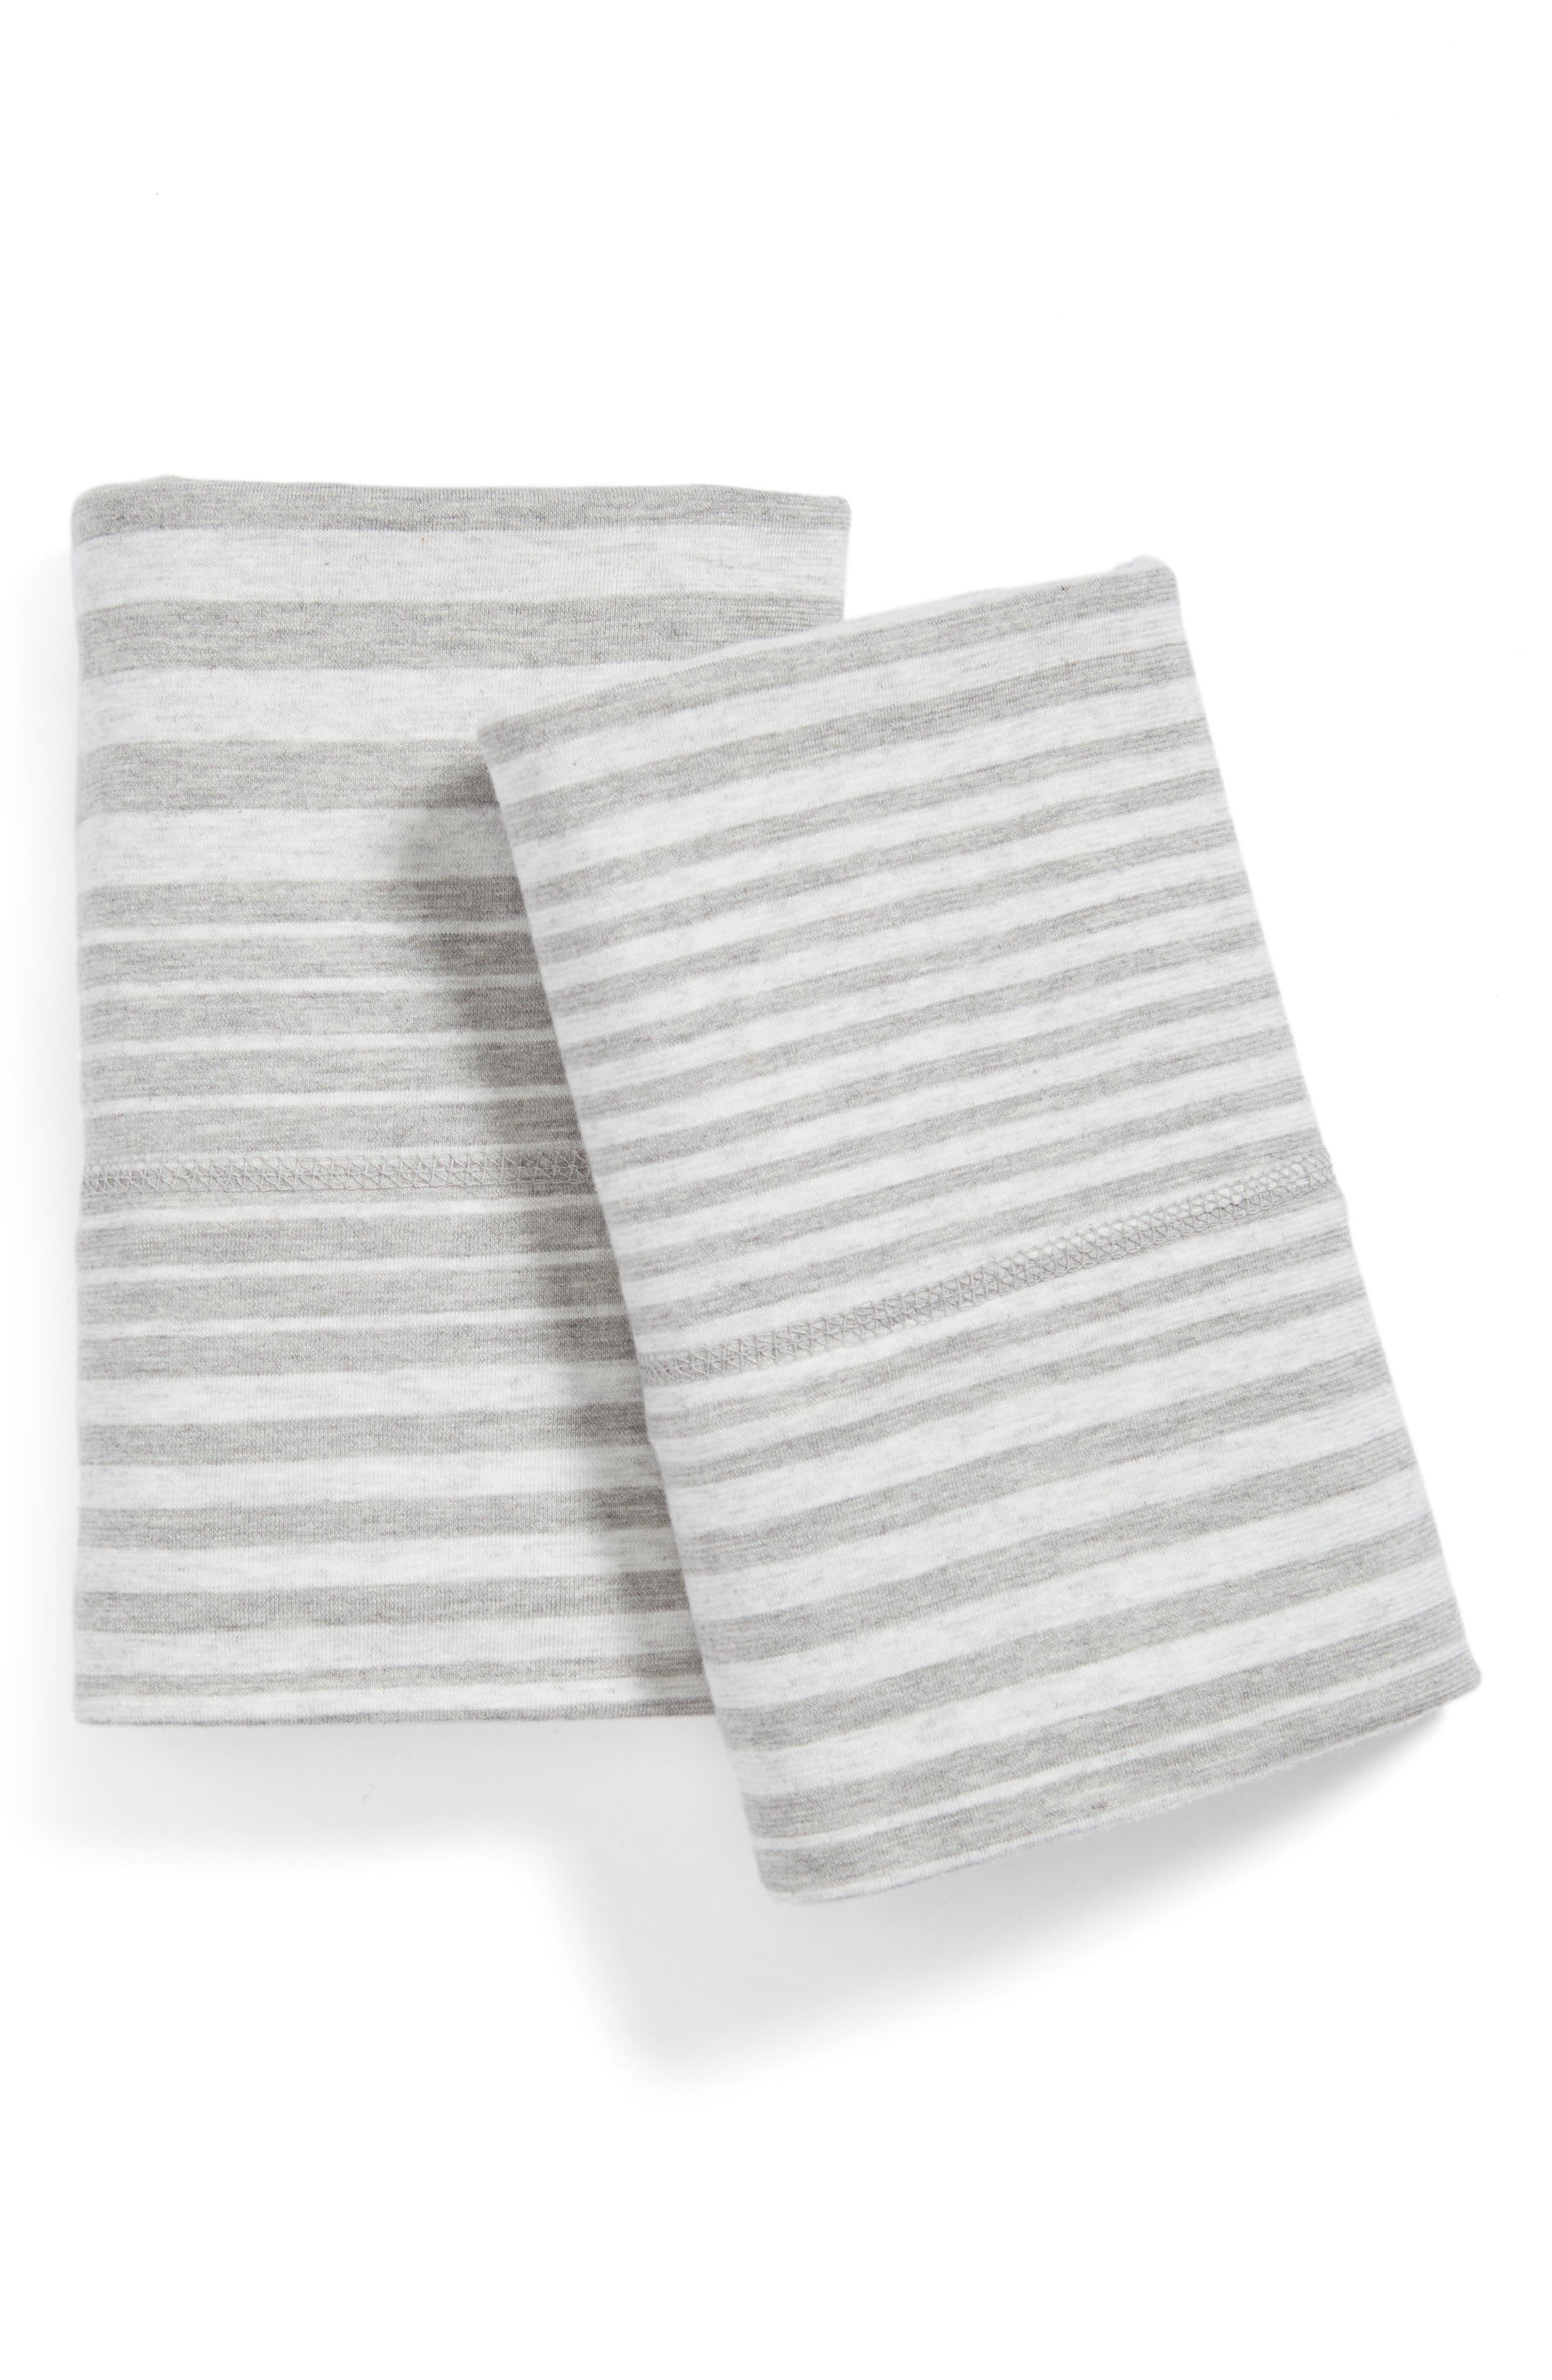 Calvin Klein Home Rhythm Set of 2 Pillowcases